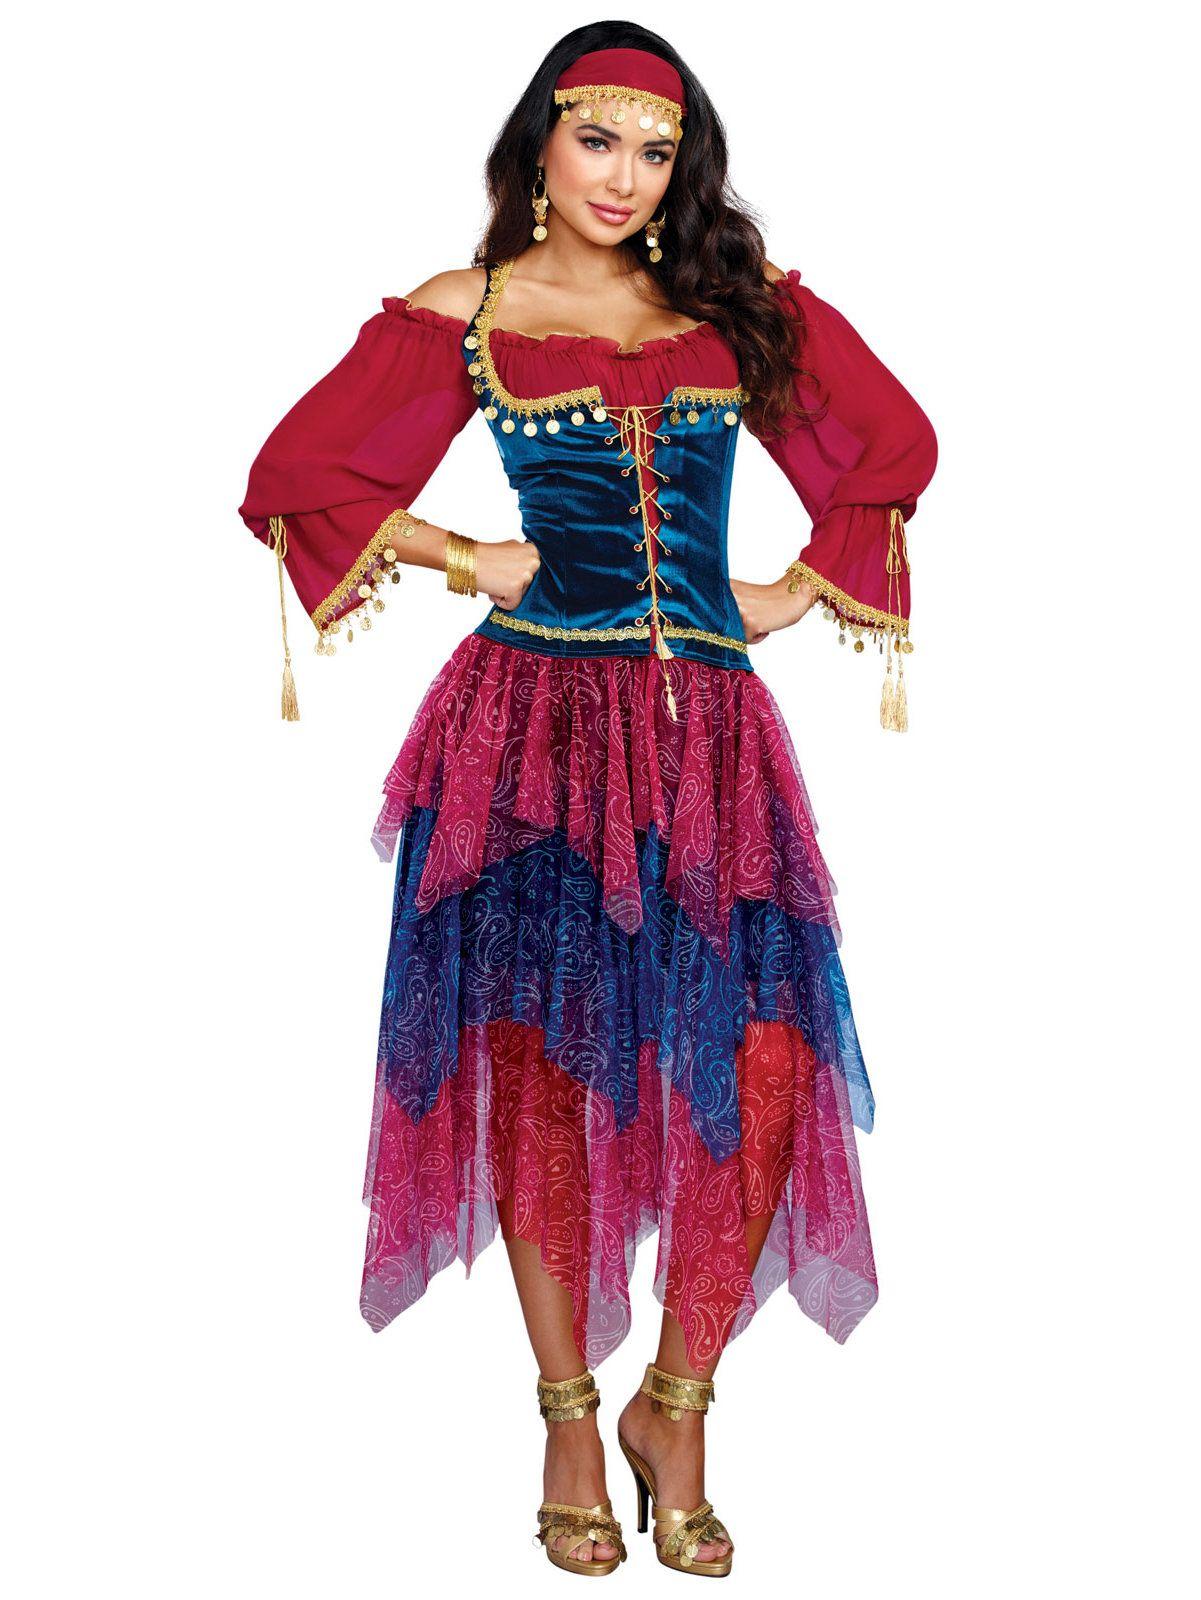 Gypsy Womenu0027s Adult Costume  sc 1 st  Pinterest & Gypsy Womenu0027s Adult Costume | Wholesale halloween costumes ...